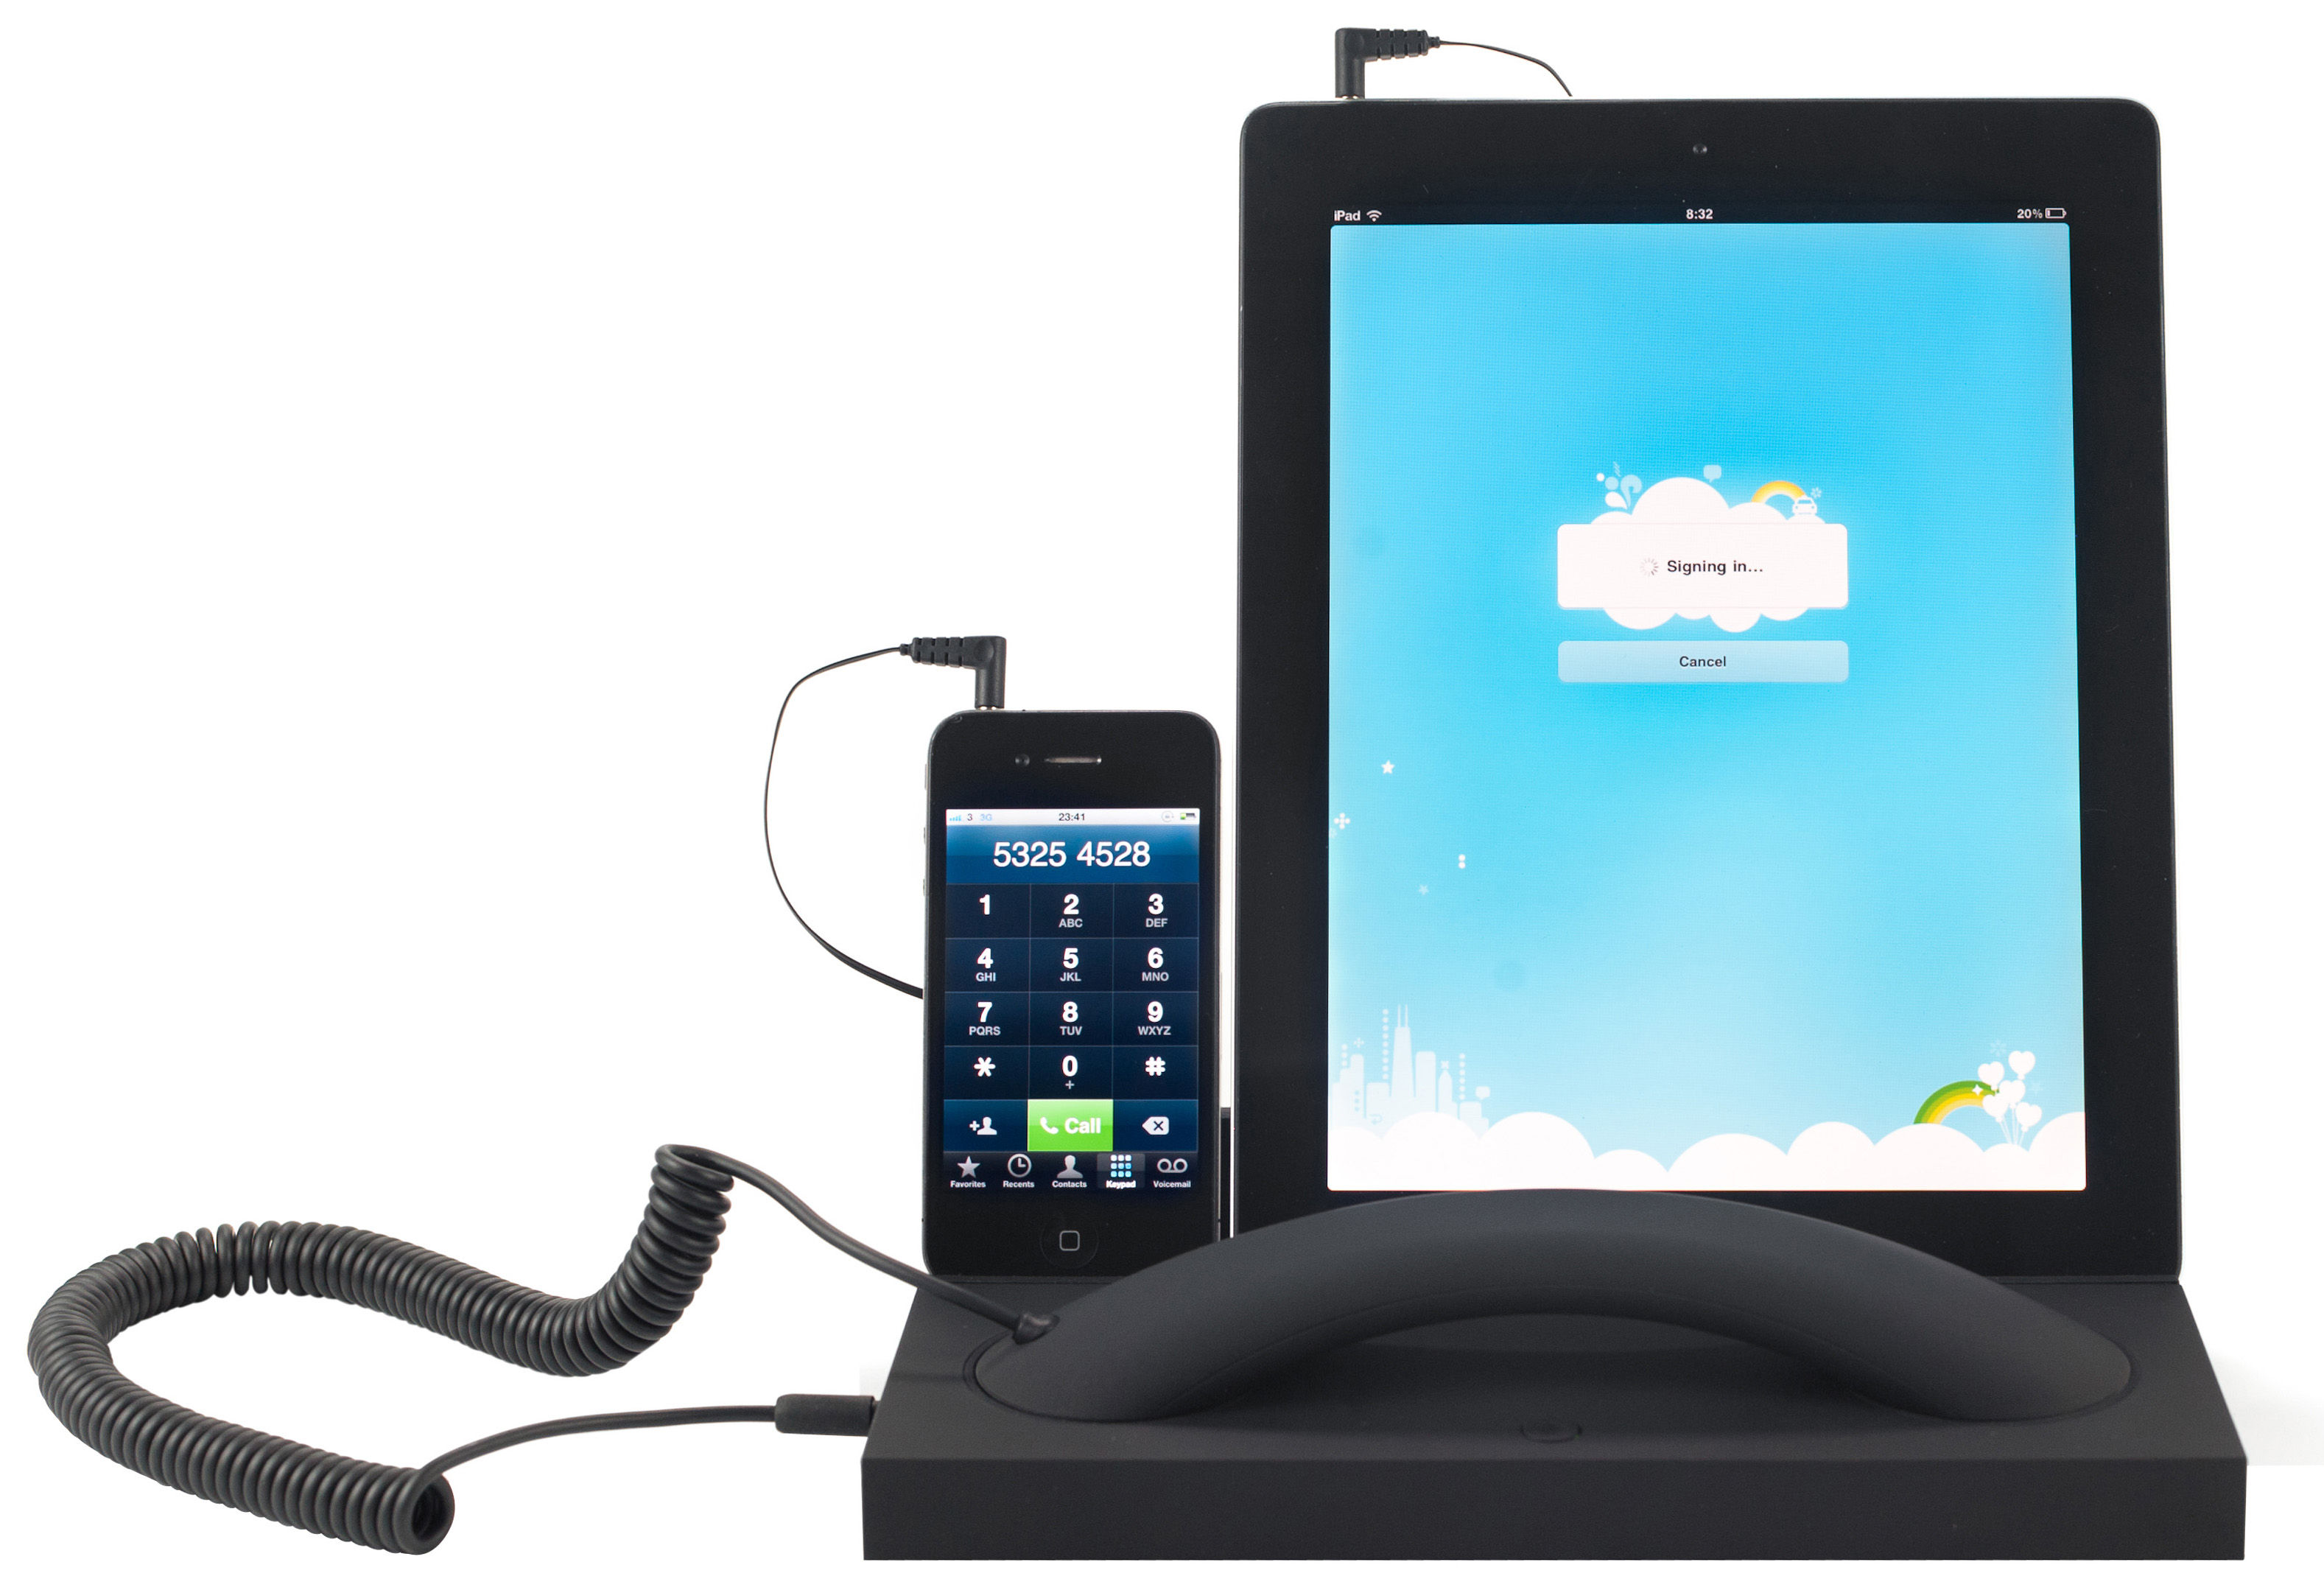 mm02t f r iphone ipad smartphones mit h rer native. Black Bedroom Furniture Sets. Home Design Ideas